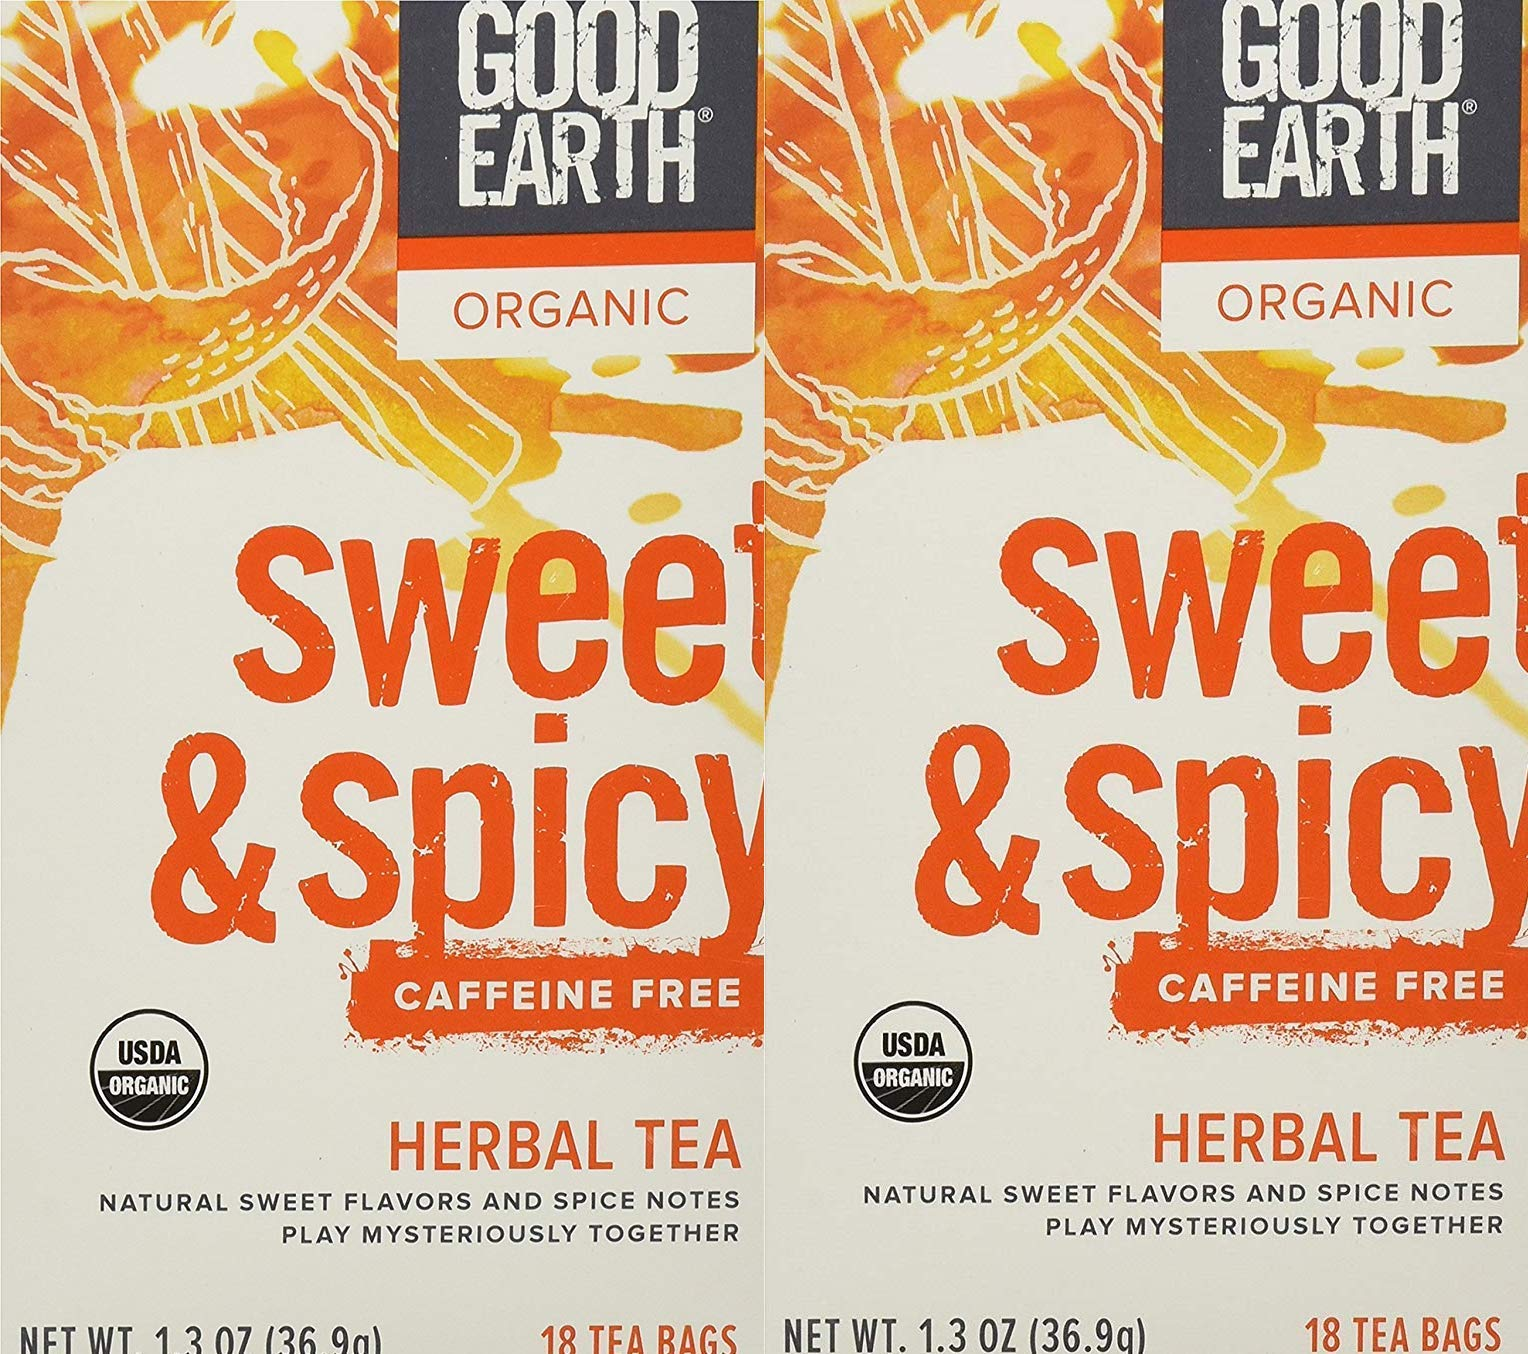 Good Earth Teas Organic Sweet and Spicy Herbal Caffeine Free Tea Bag, 18 Count (2-Pack)